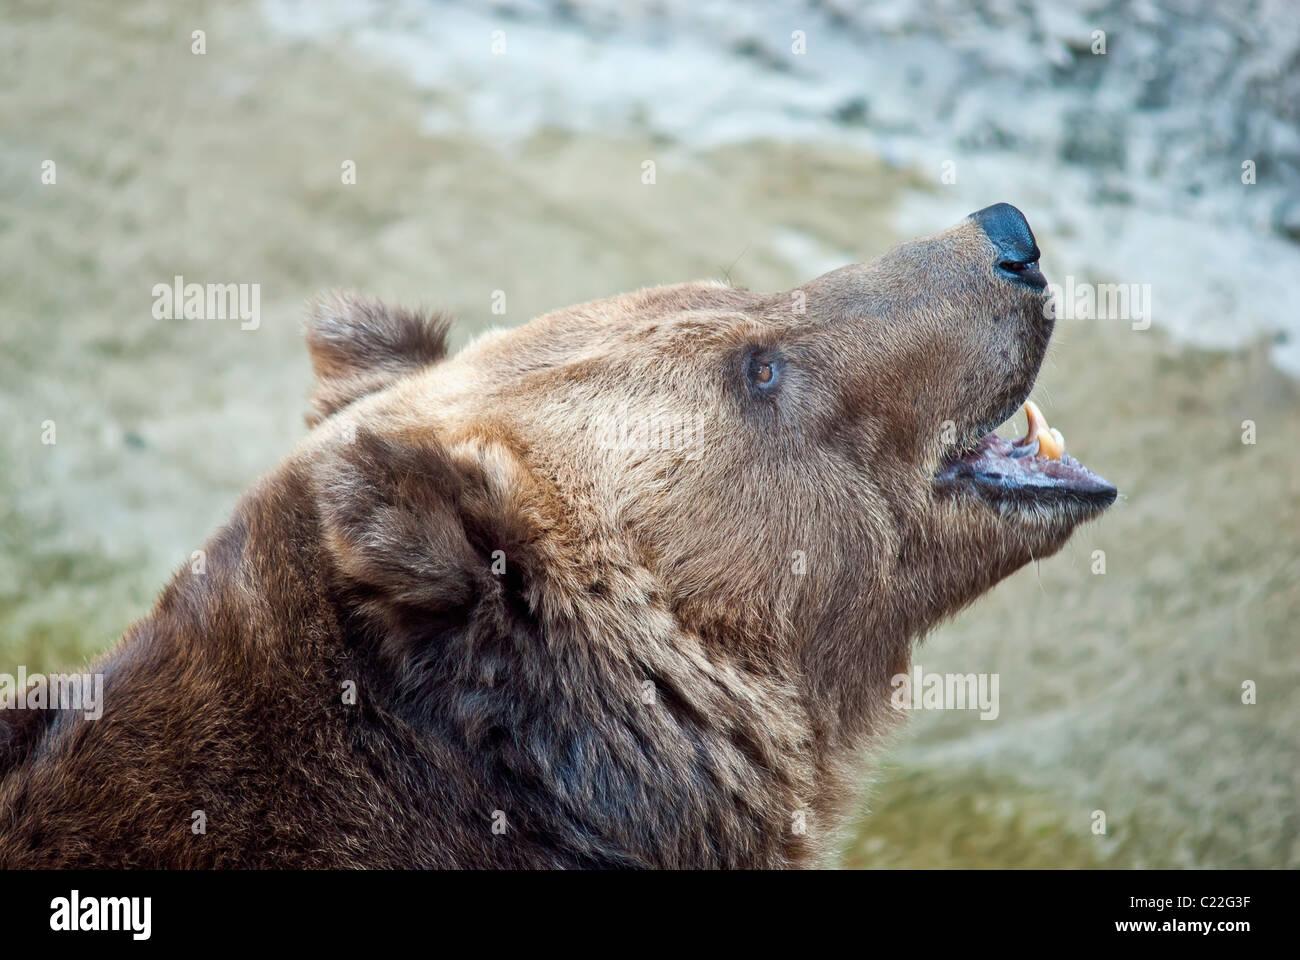 Brown bear roars - Stock Image